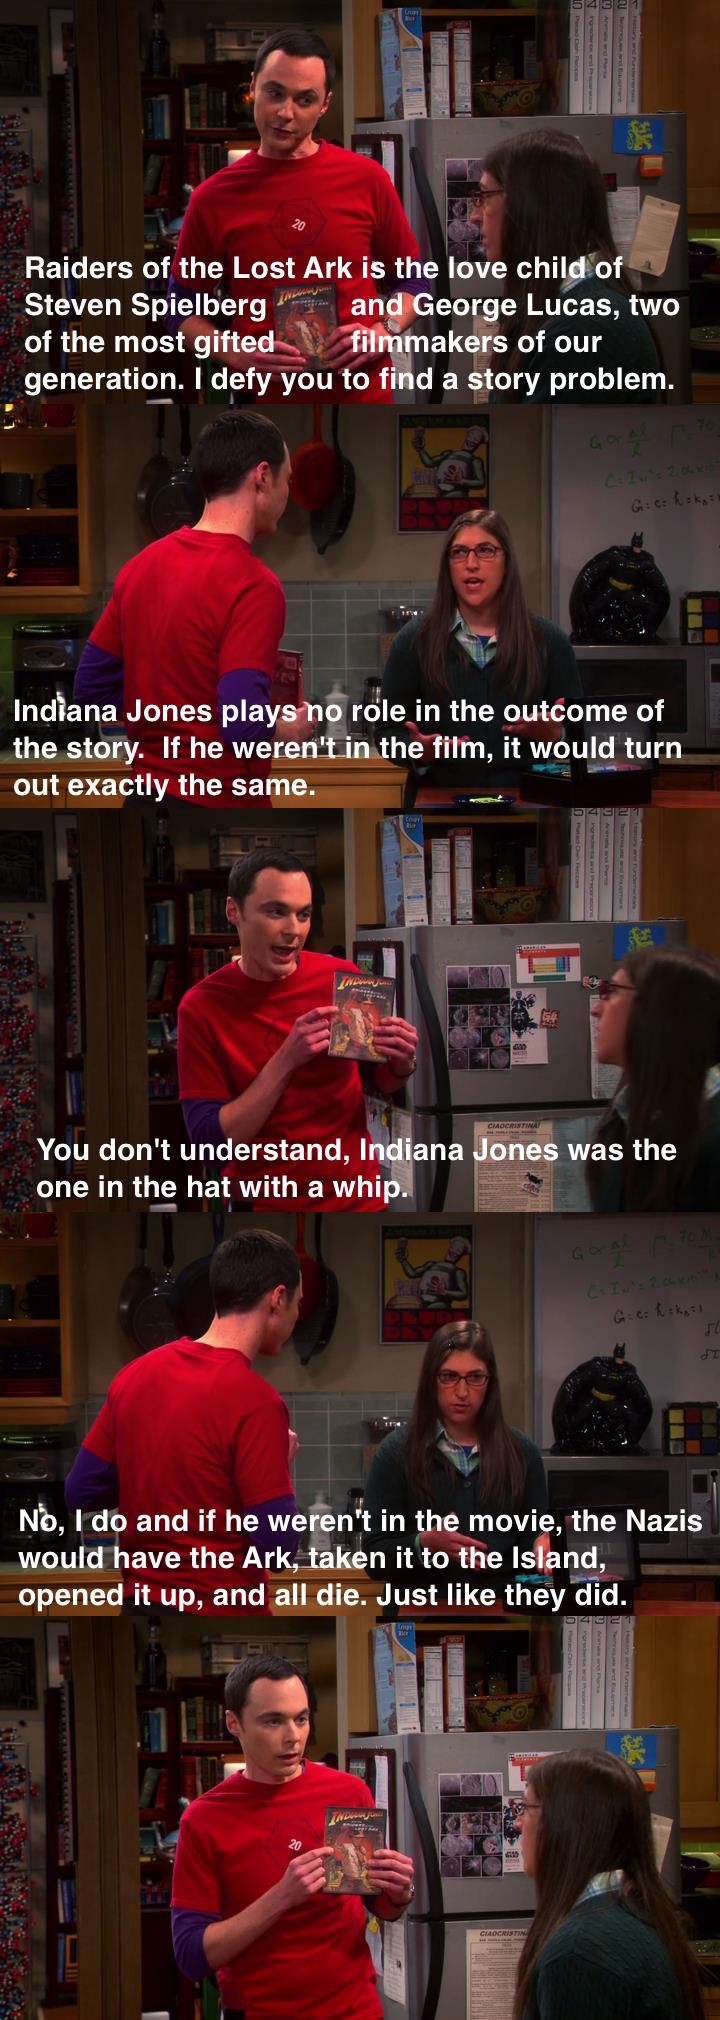 the big bang theory, indiana jones, stephen spielberg, george lucas